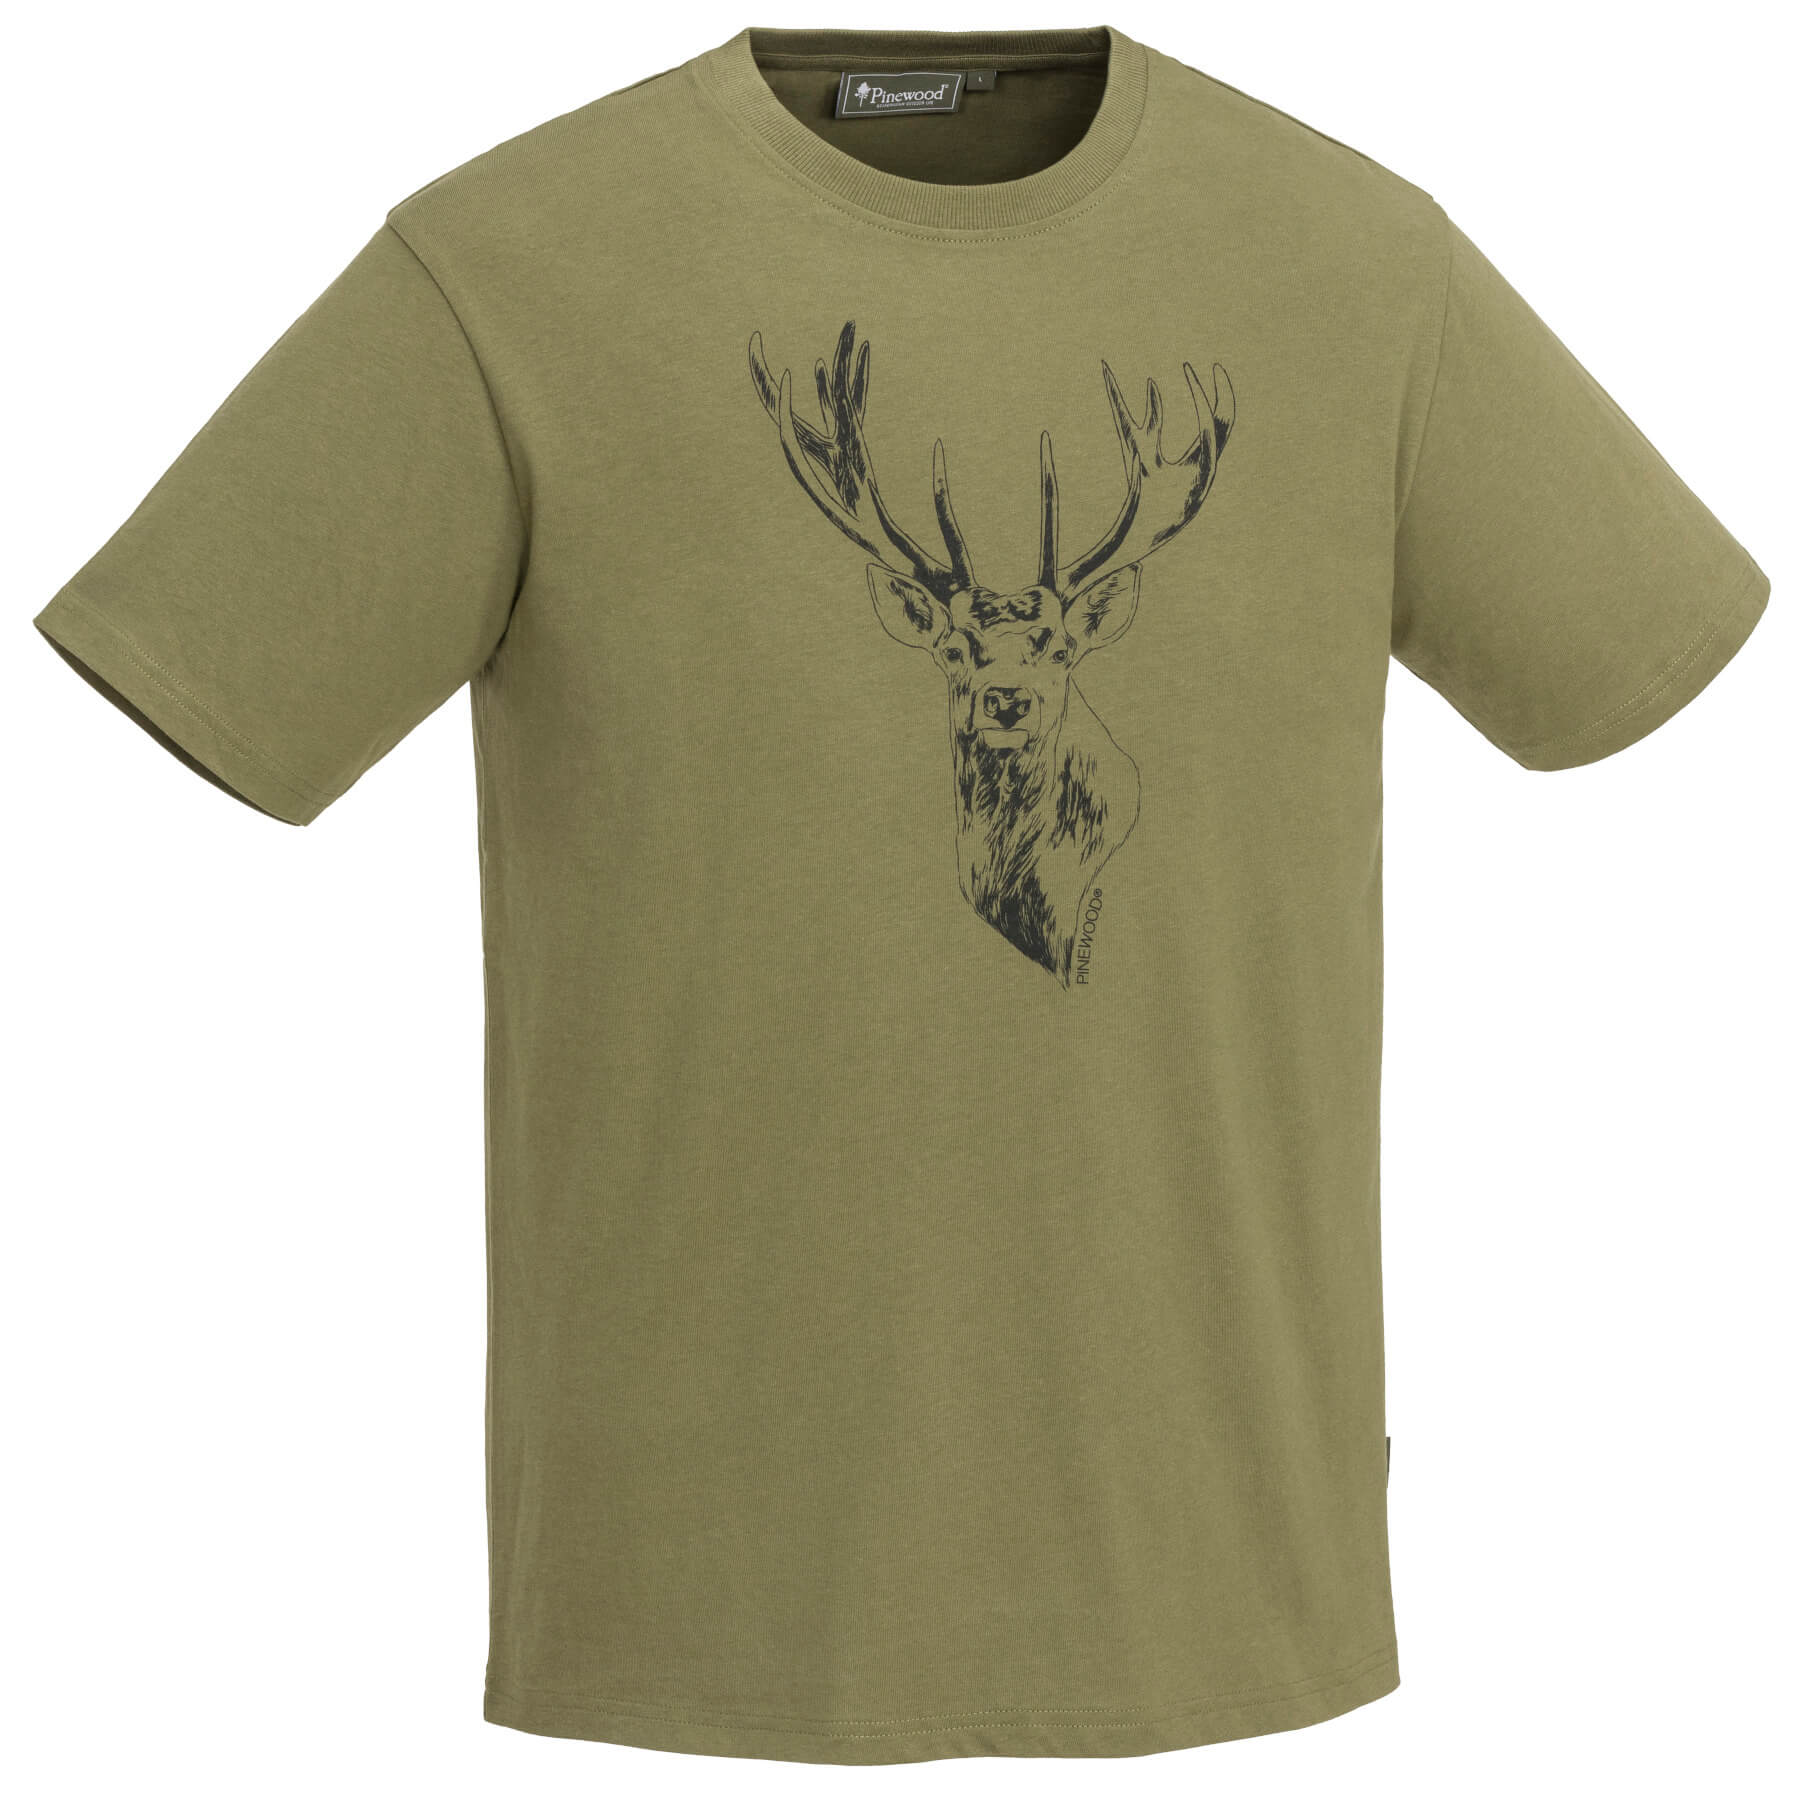 T-Shirt oliv mit Hirschmotiv